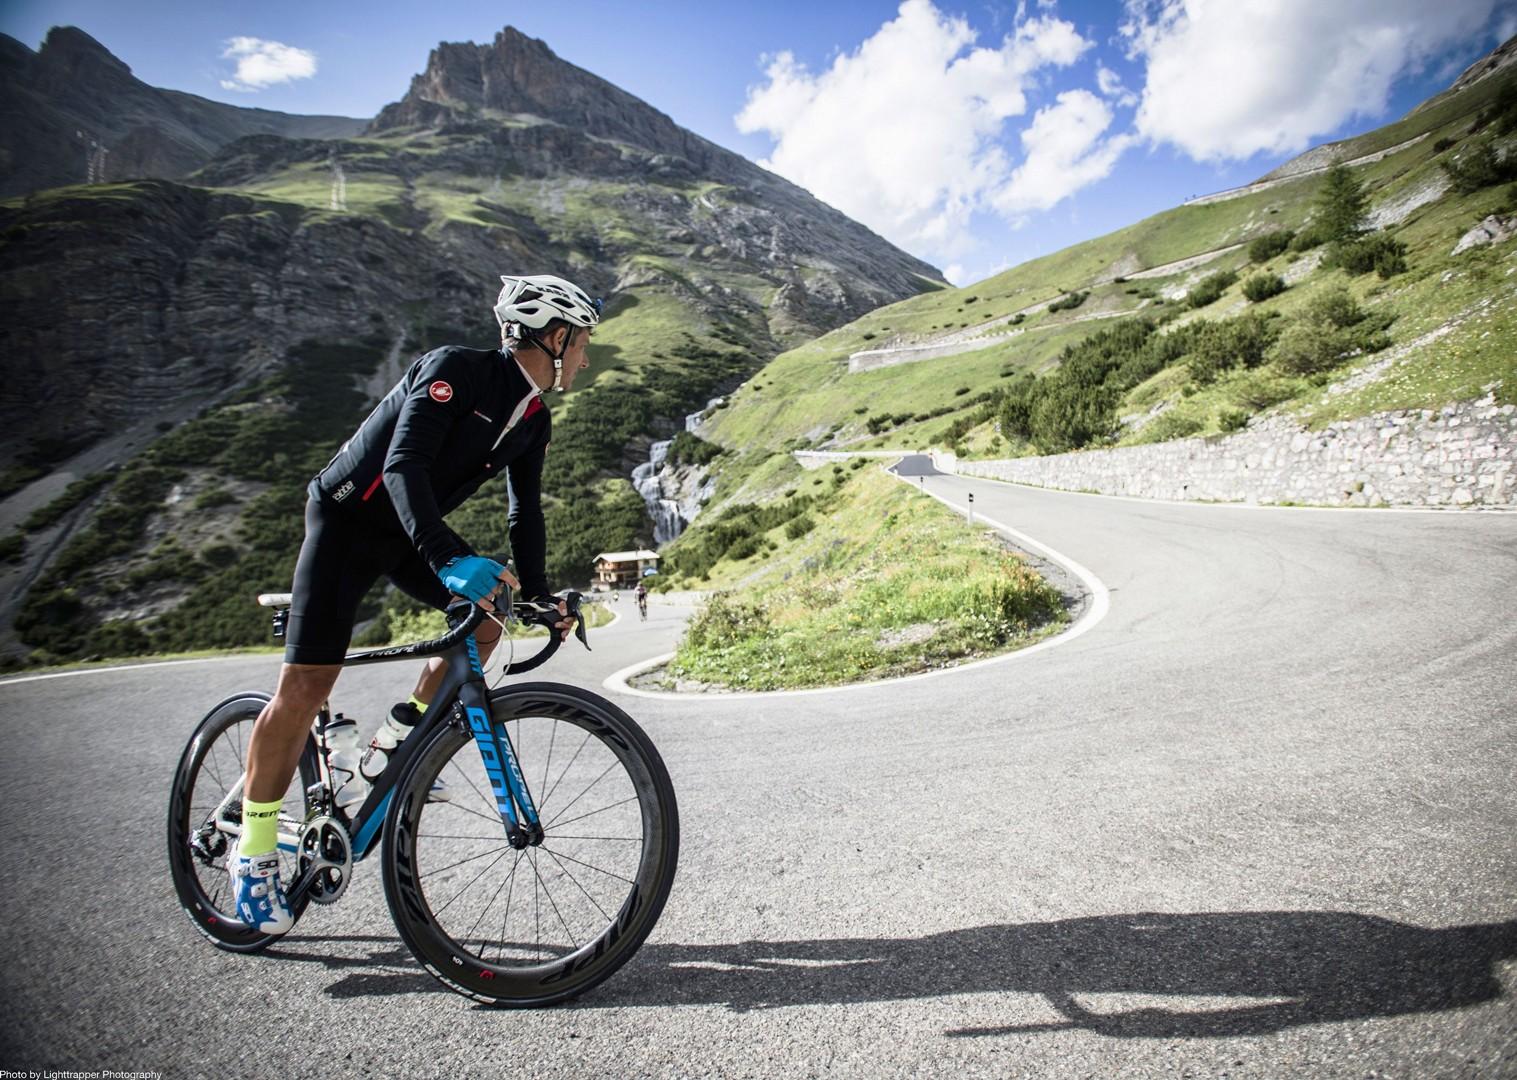 italian-alps-guided-road-cycling-holiday.jpg - Italy - Italian Alps Introduction - Guided Road Cycling Holiday - Road Cycling